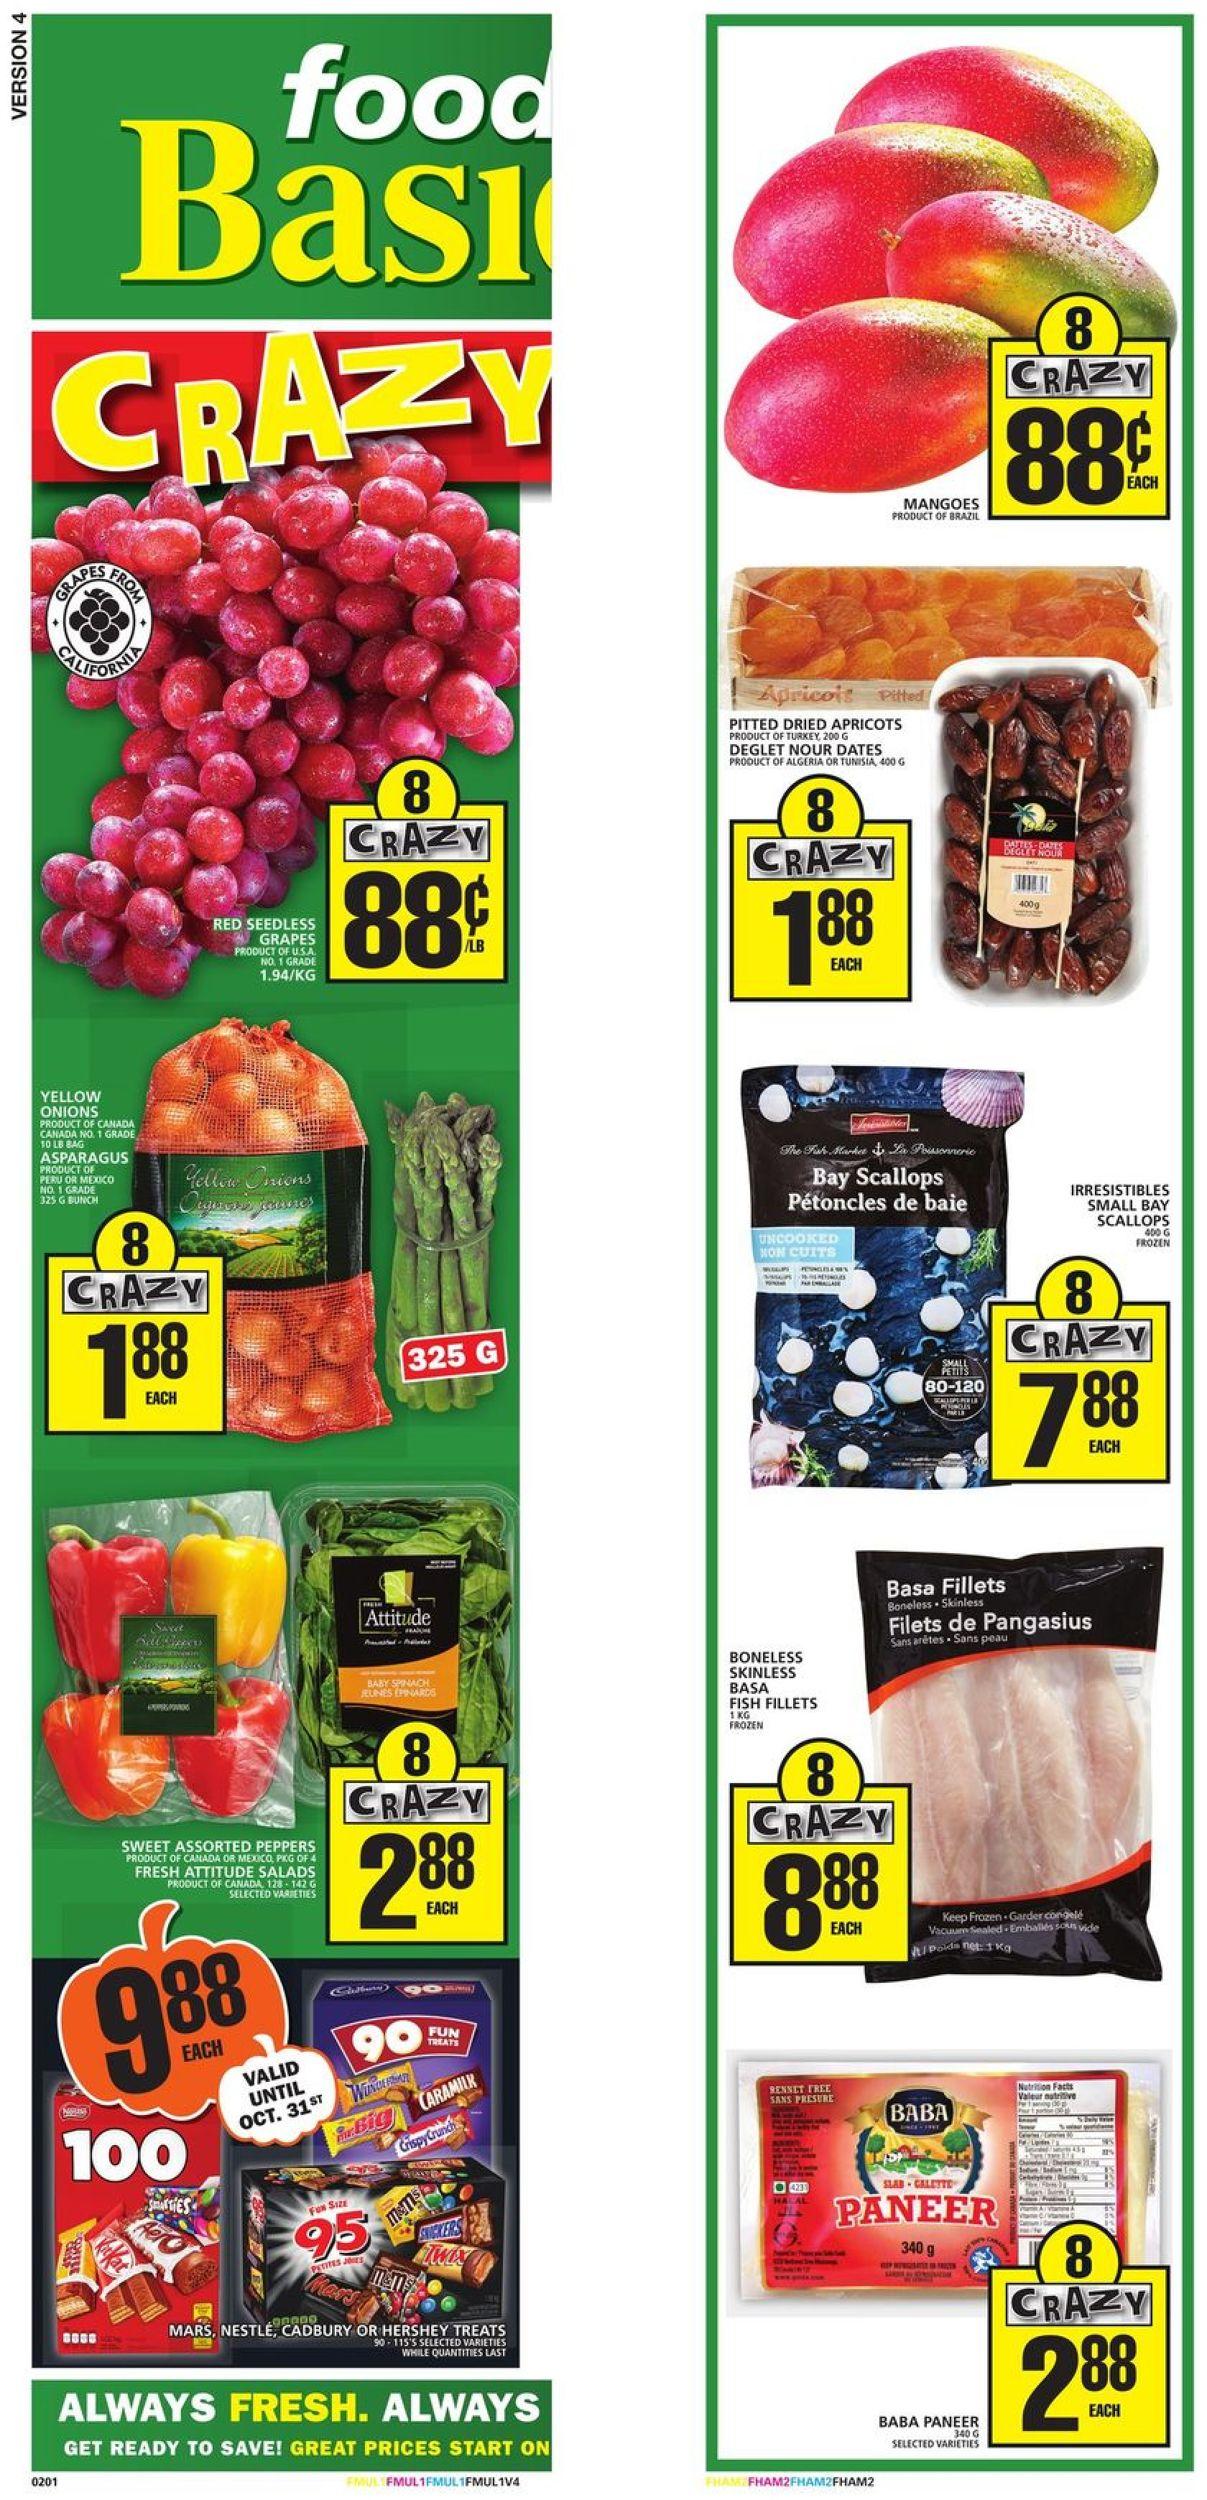 Food Basics Flyer - 10/24-10/30/2019 (Page 2)